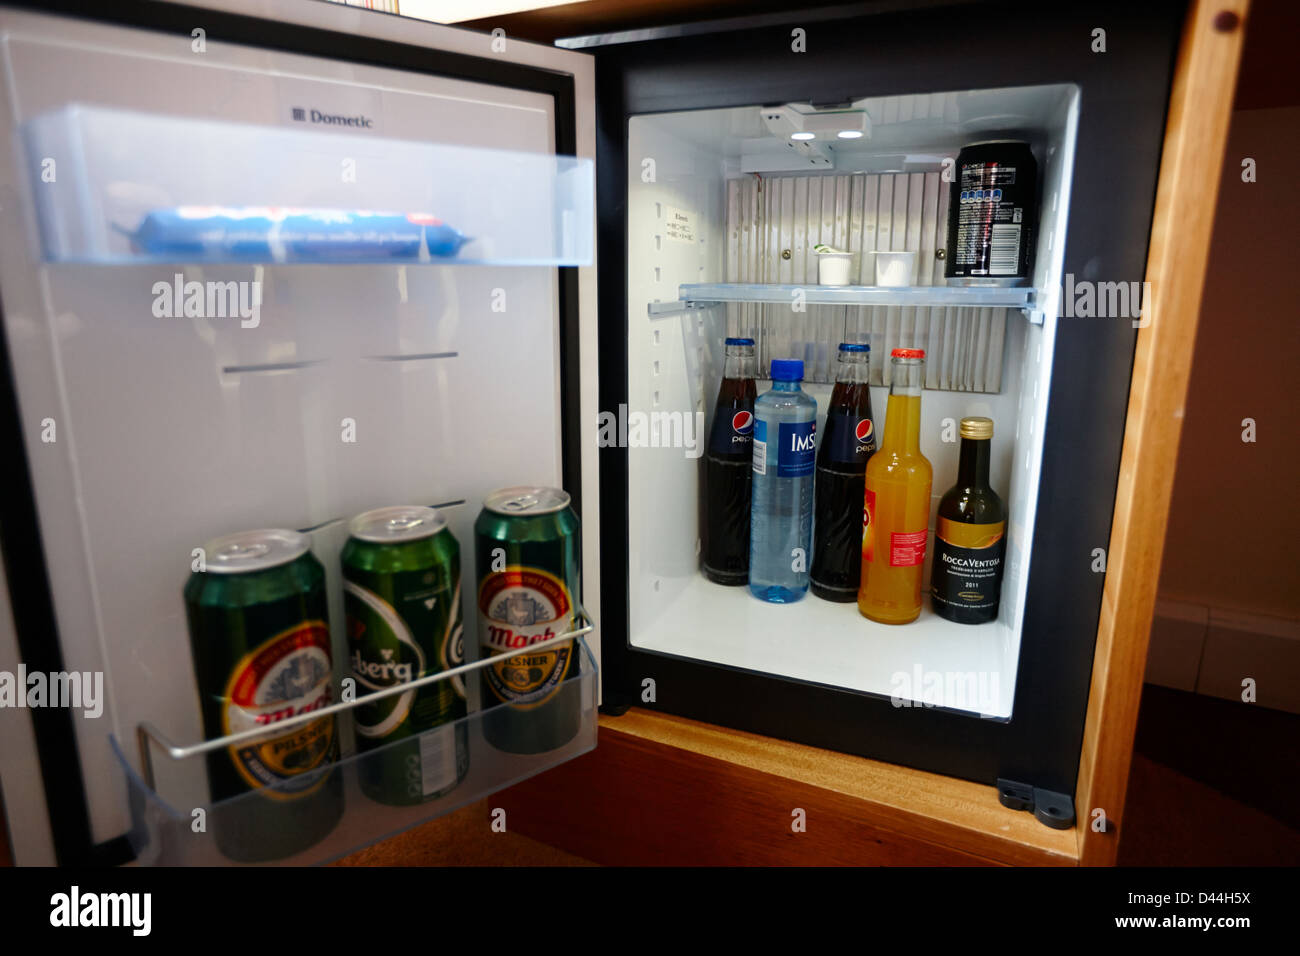 Minibar Als Kühlschrank Nutzen : Hotel minibar kühlschrank in tromso troms norwegen europa stockfoto